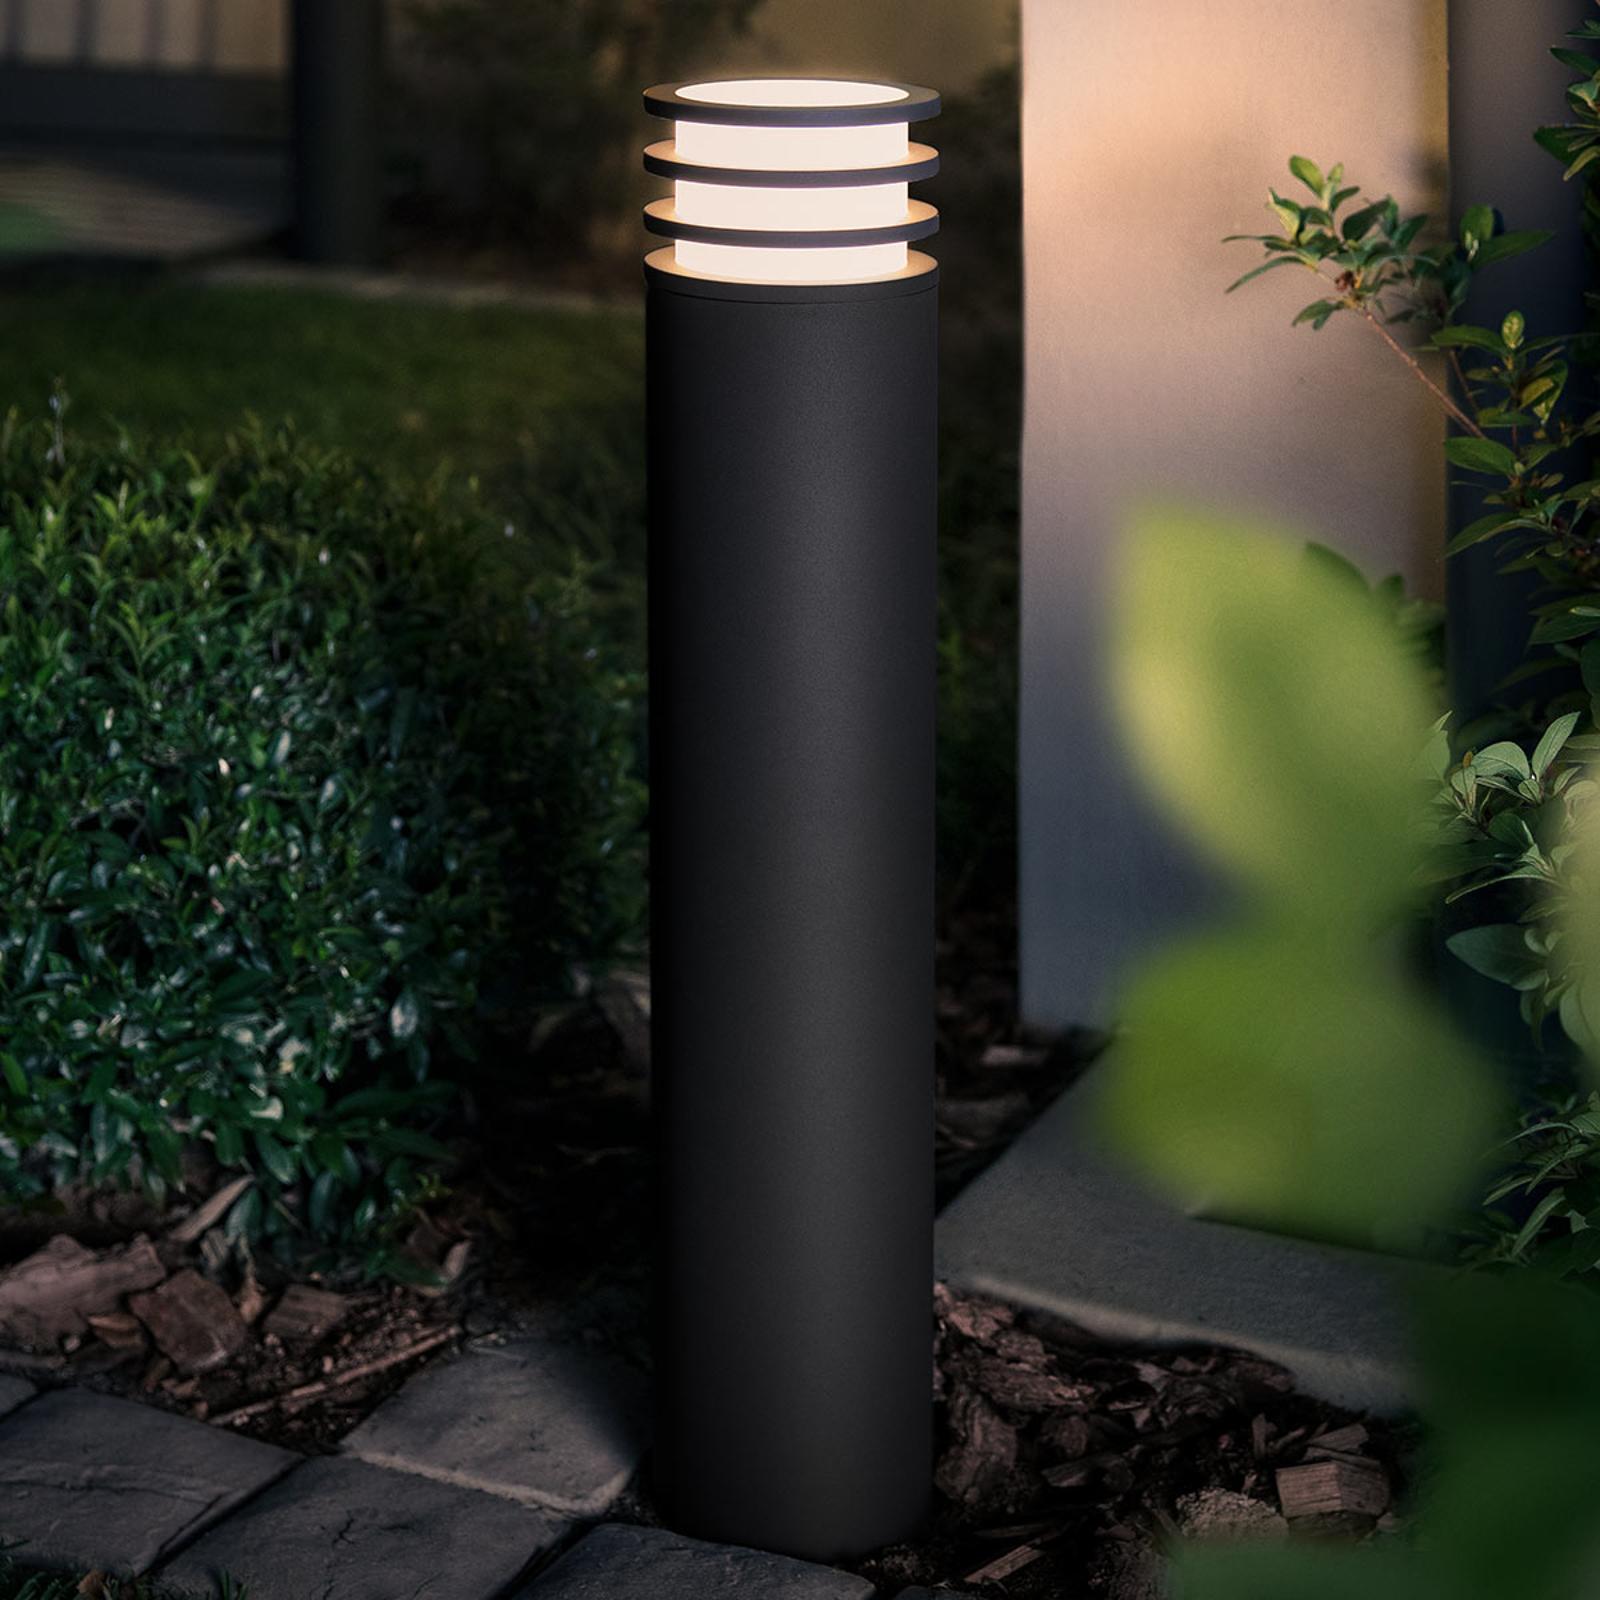 Philips Hue White Lucca LED-Wegeleuchte steuerbar